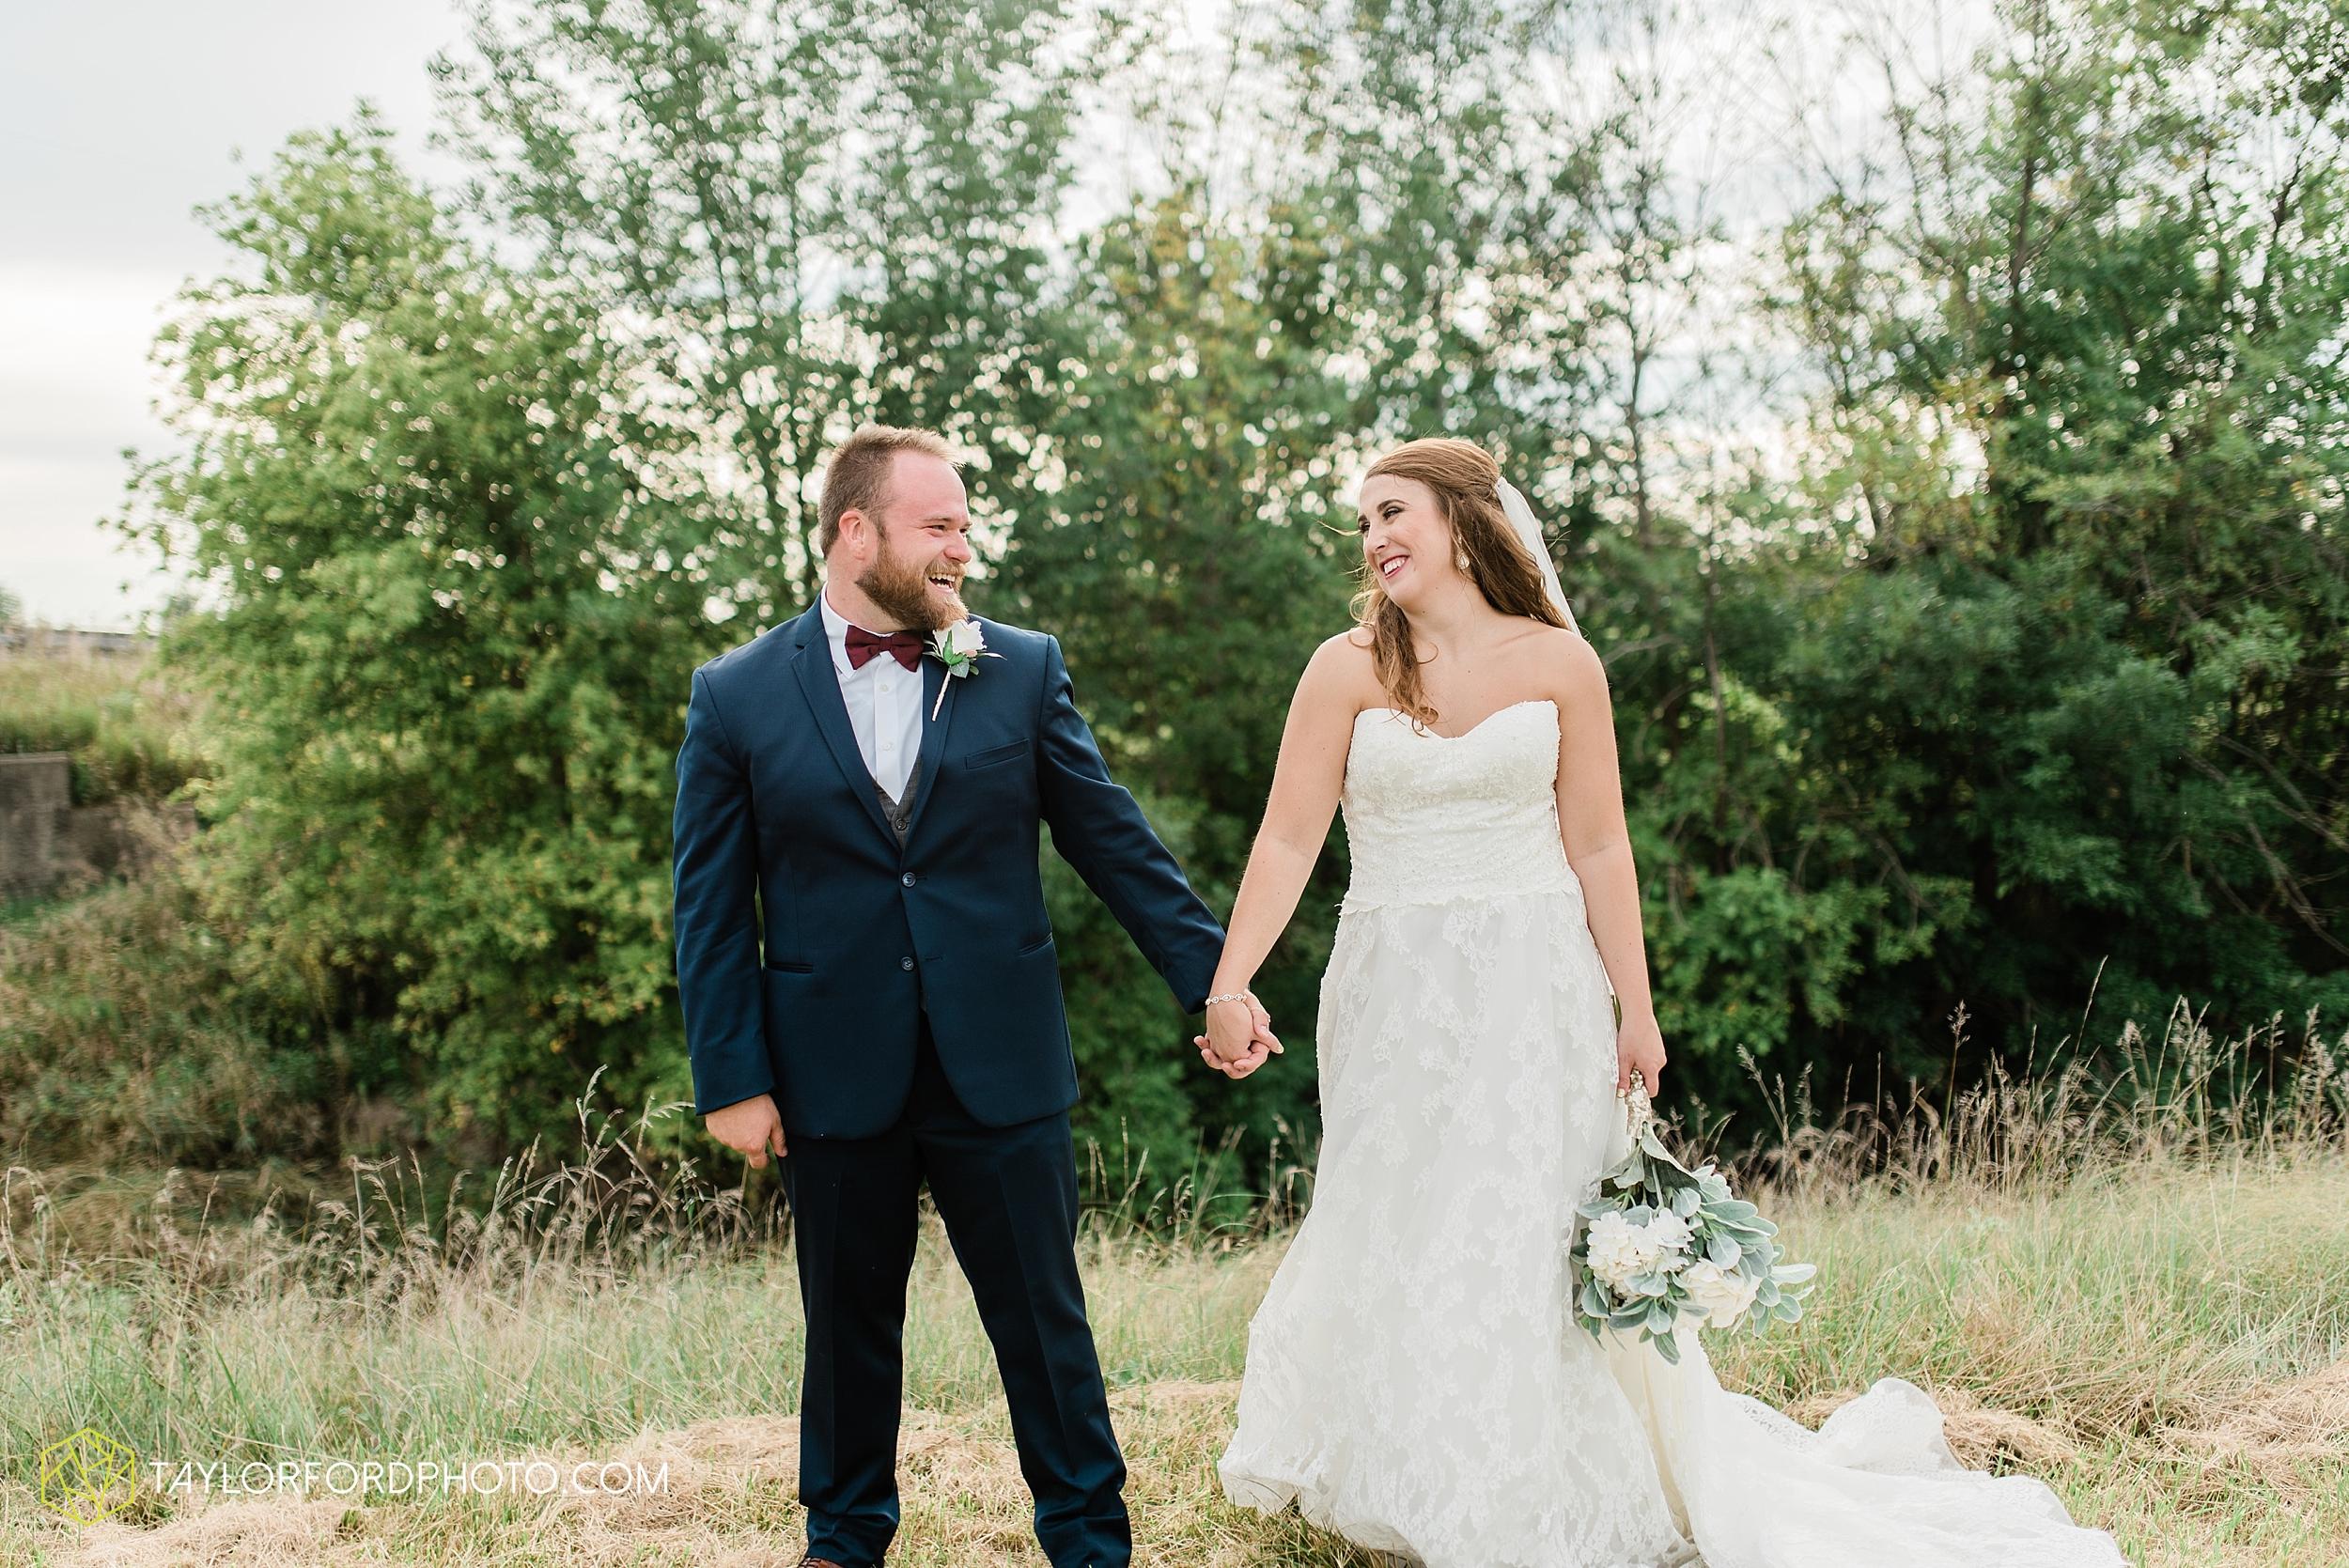 chelsey-zosh-jackson-young-first-united-methodist-church-senior-center-van-wert-ohio-wedding-photographer-taylor-ford-photography_0094.jpg